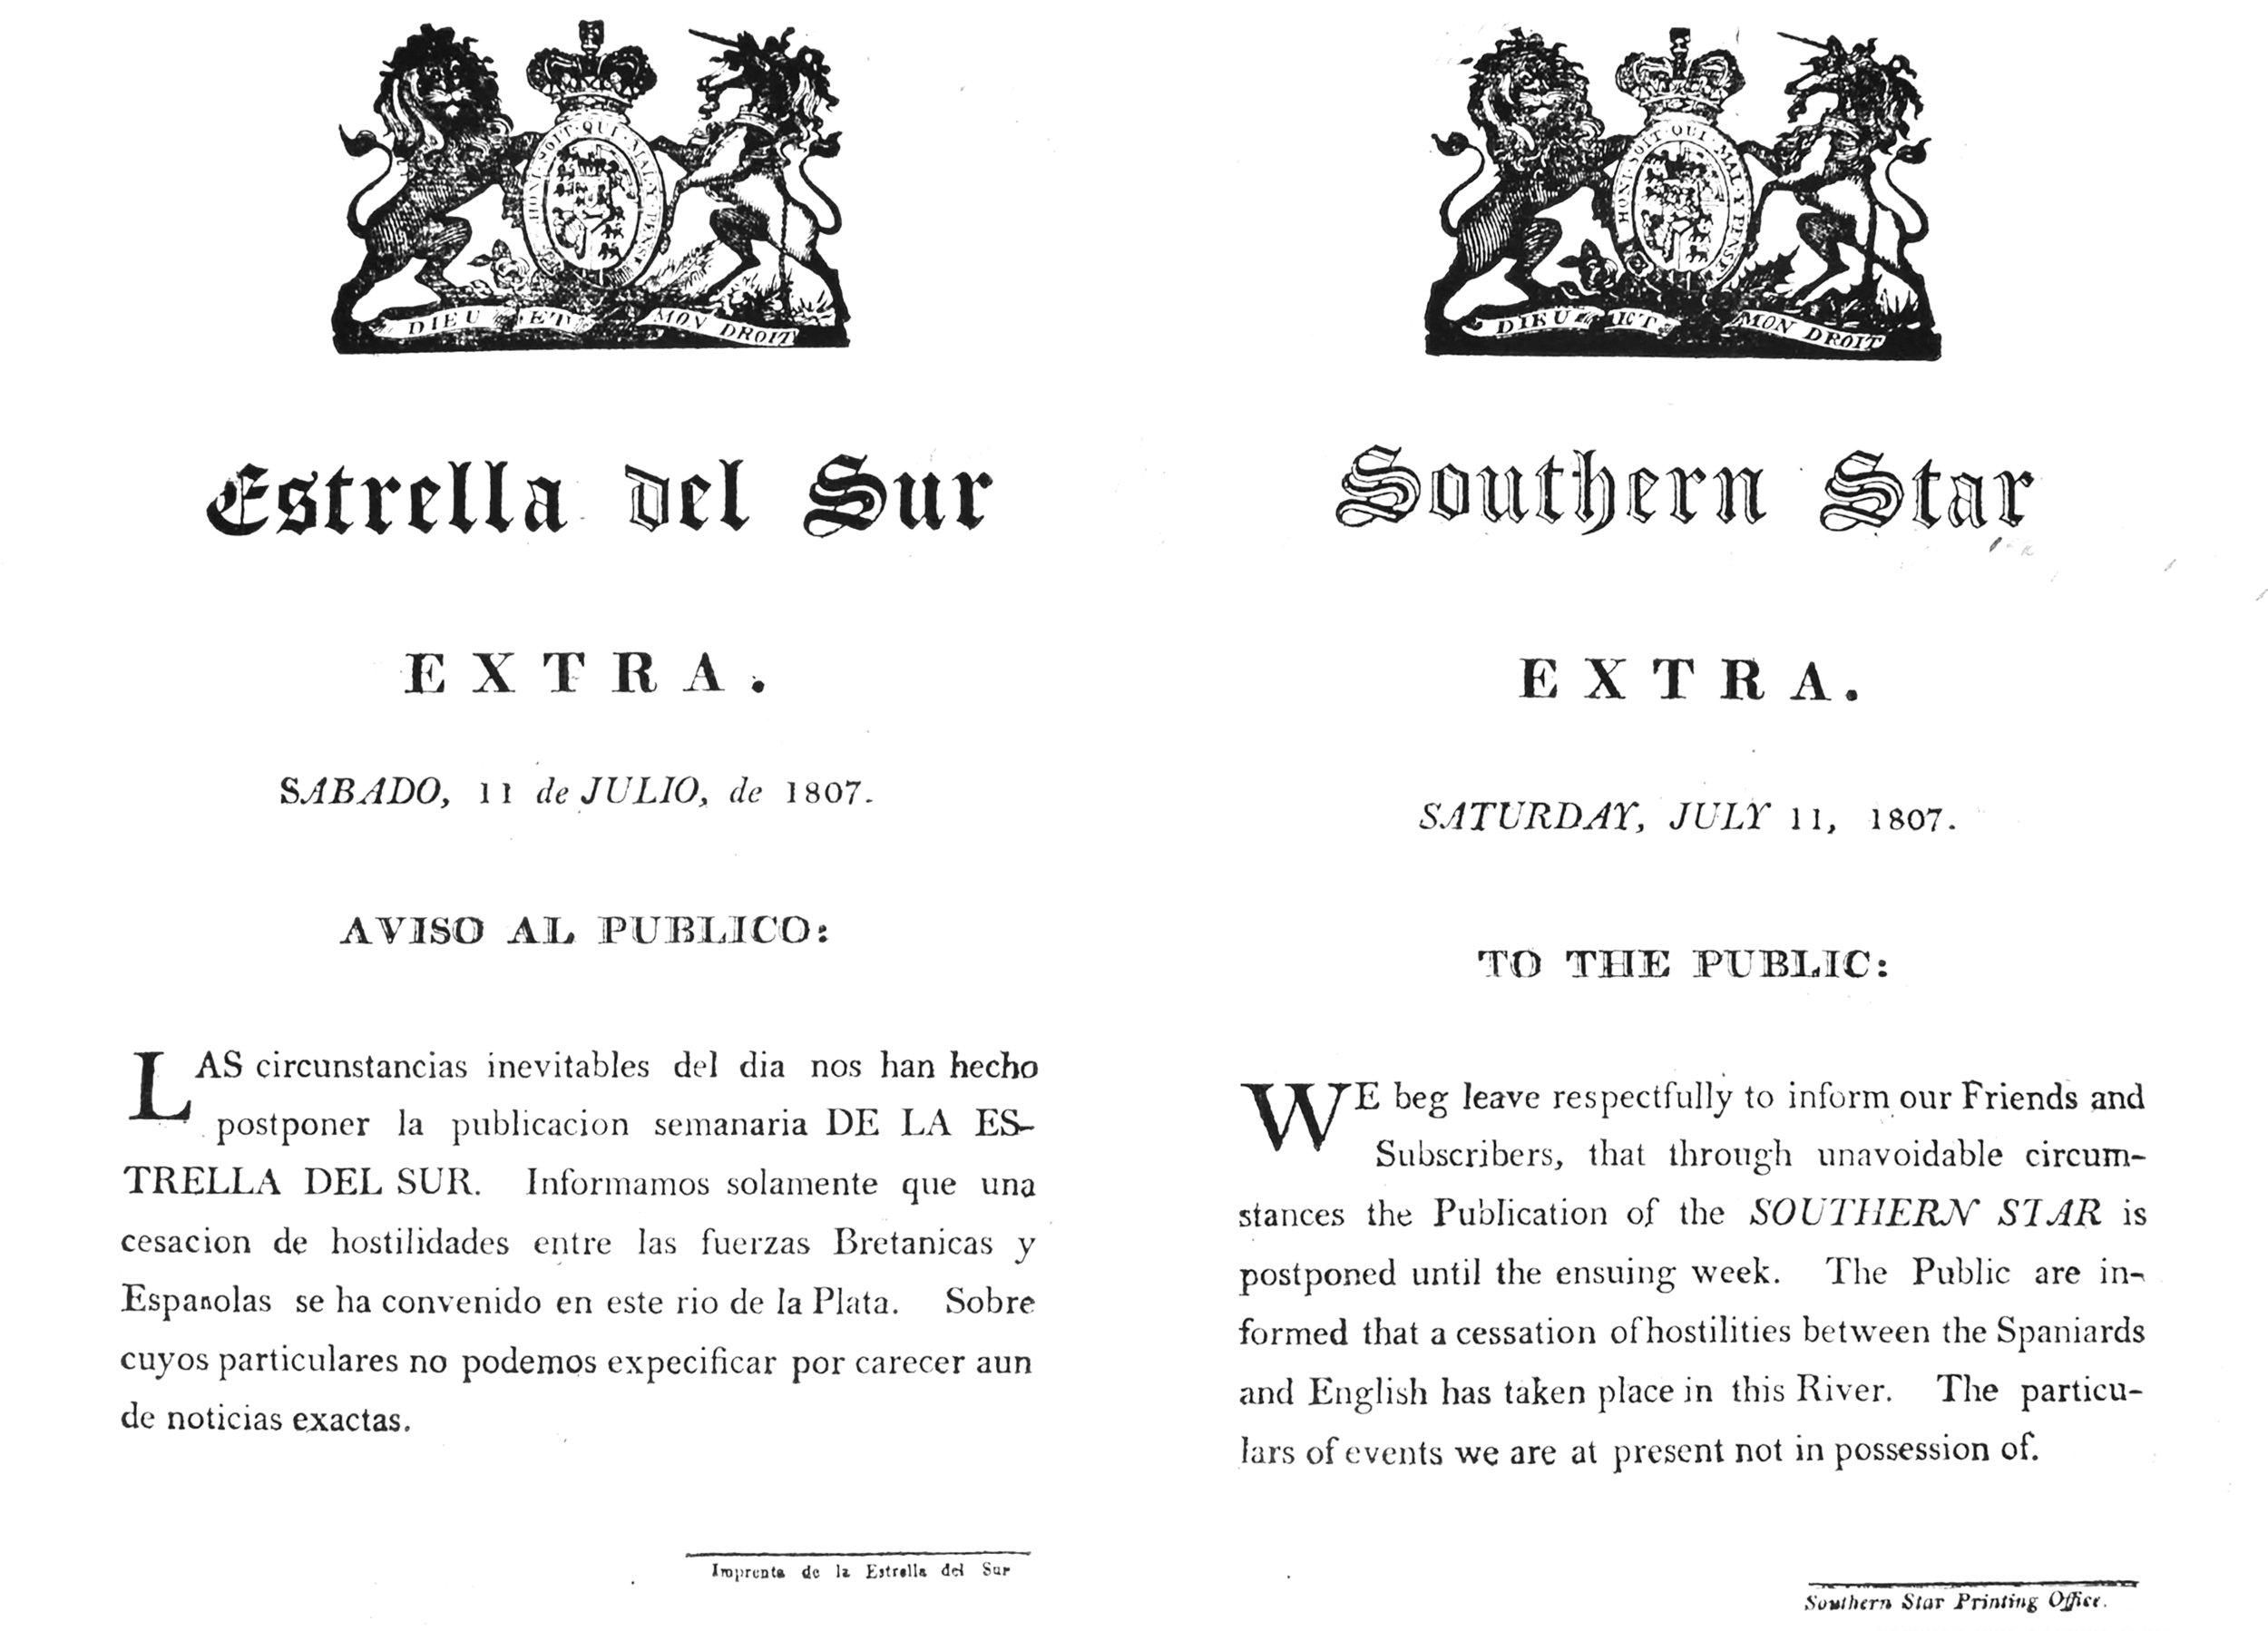 3. Extra (1807).jpg